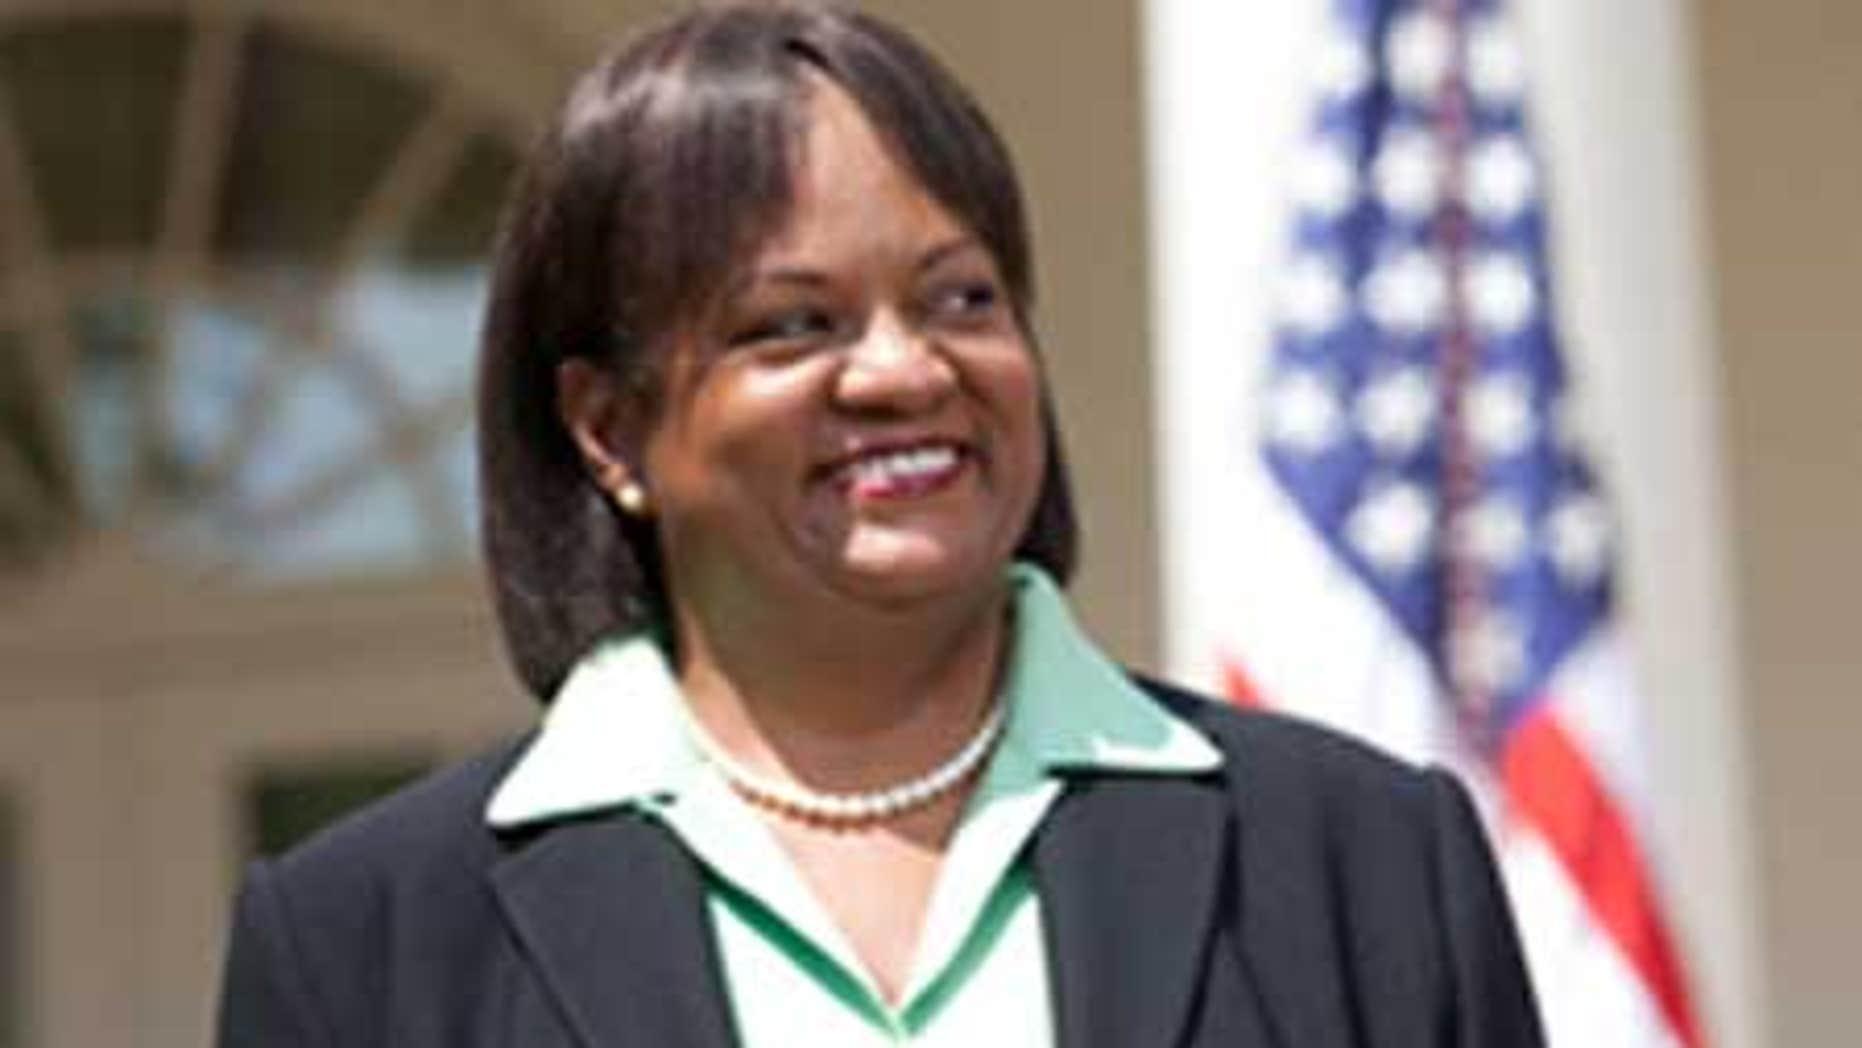 Dr. Regina Benjamin, Obama's pick for surgeon general